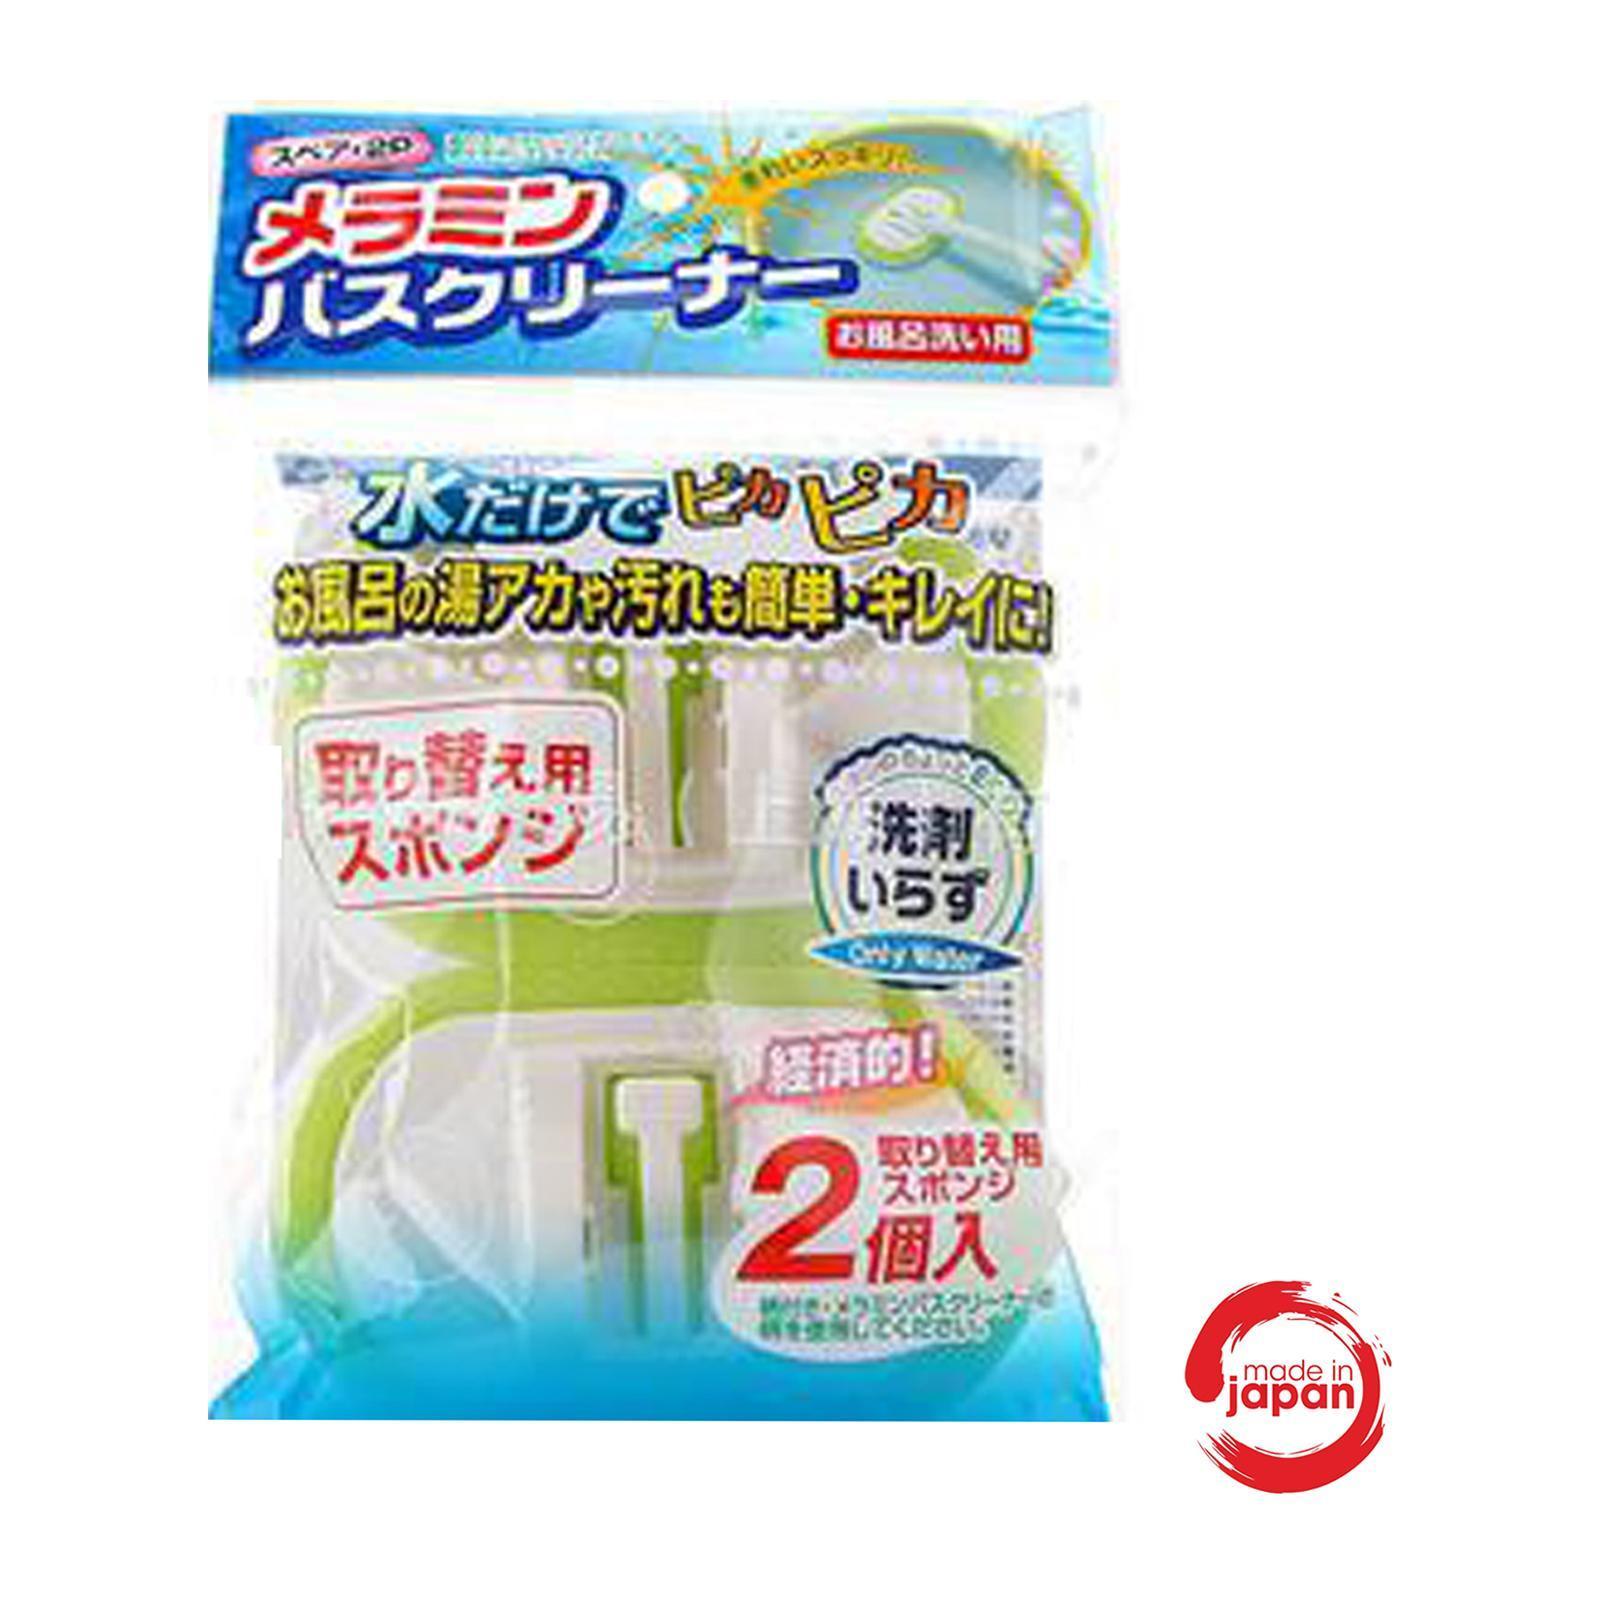 Nomi - Bath - Melamine Sponge Cleaner 2 PCS